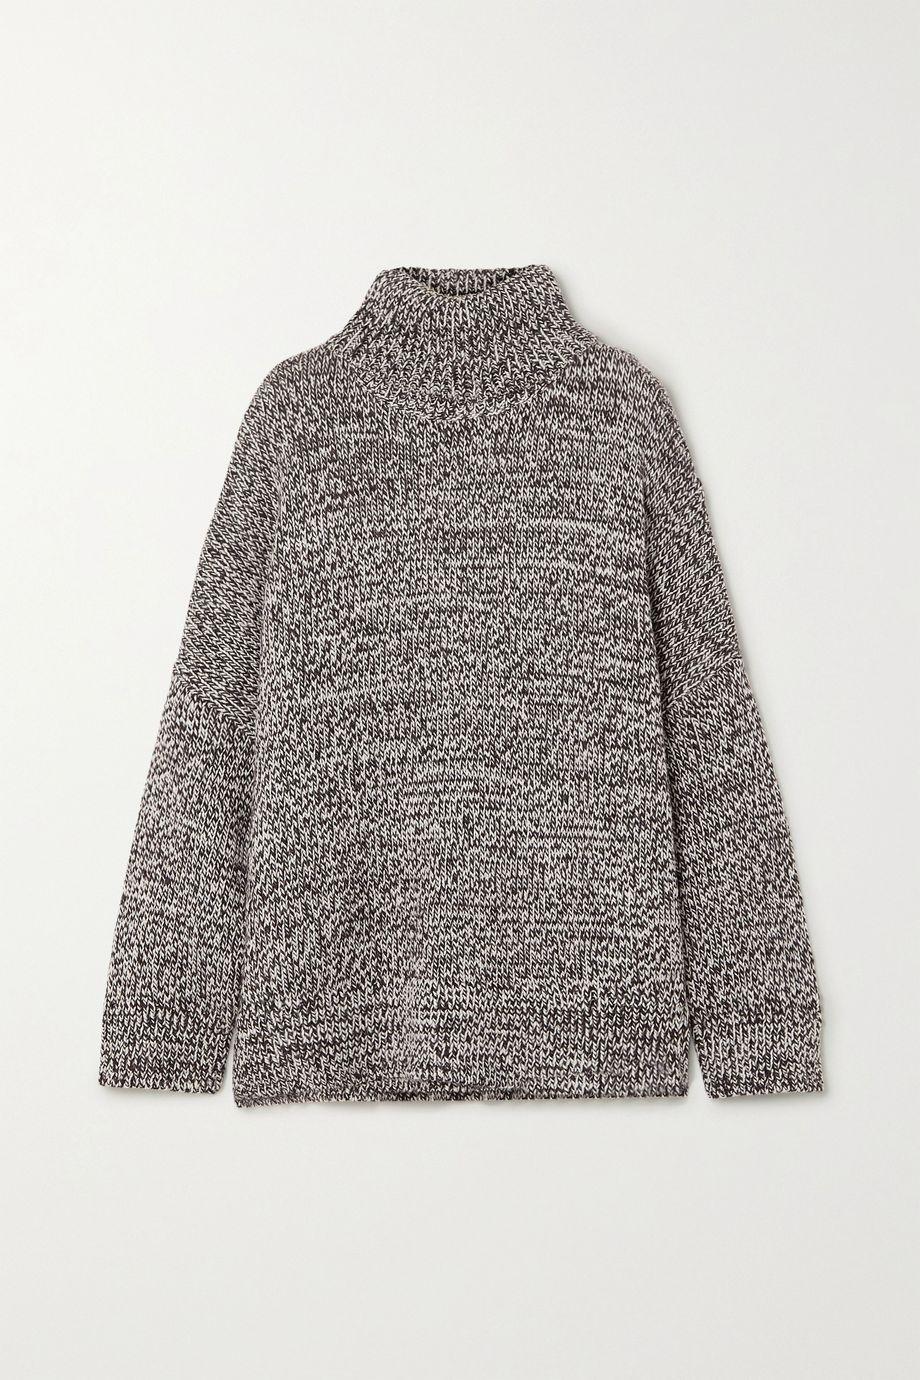 Co Oversized mélange merino wool turtleneck sweater